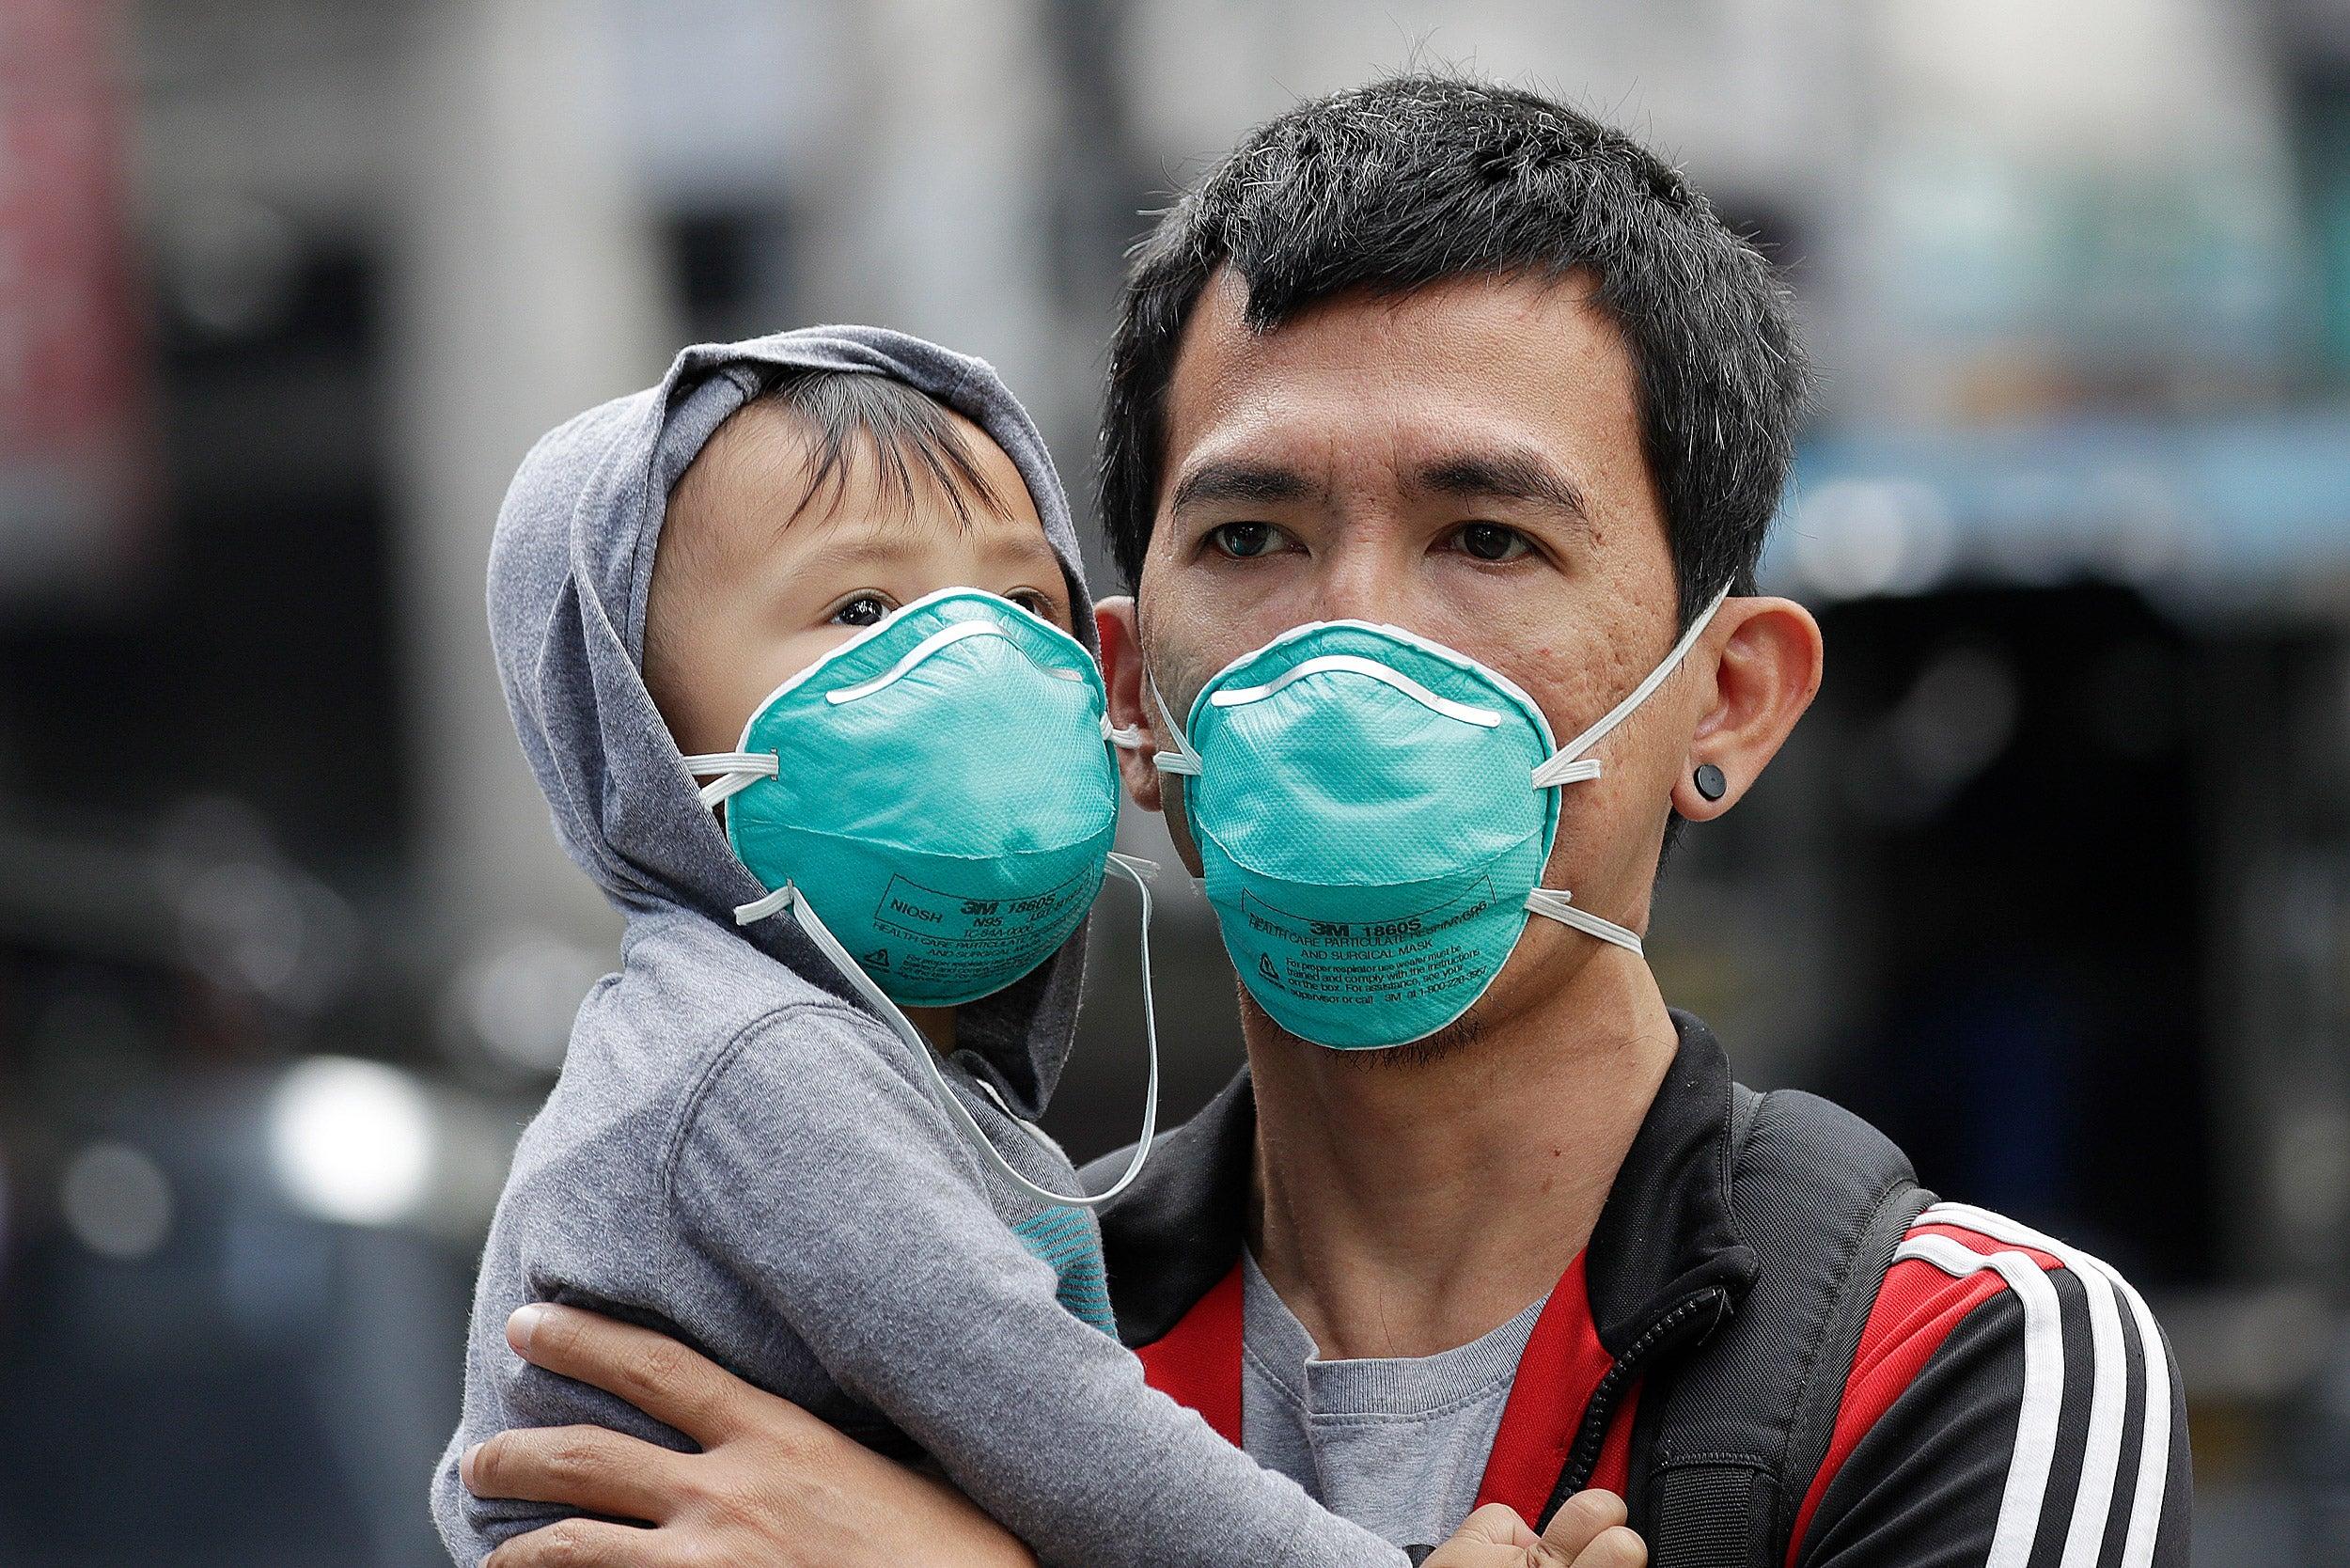 Adult and child wearing flu masks.